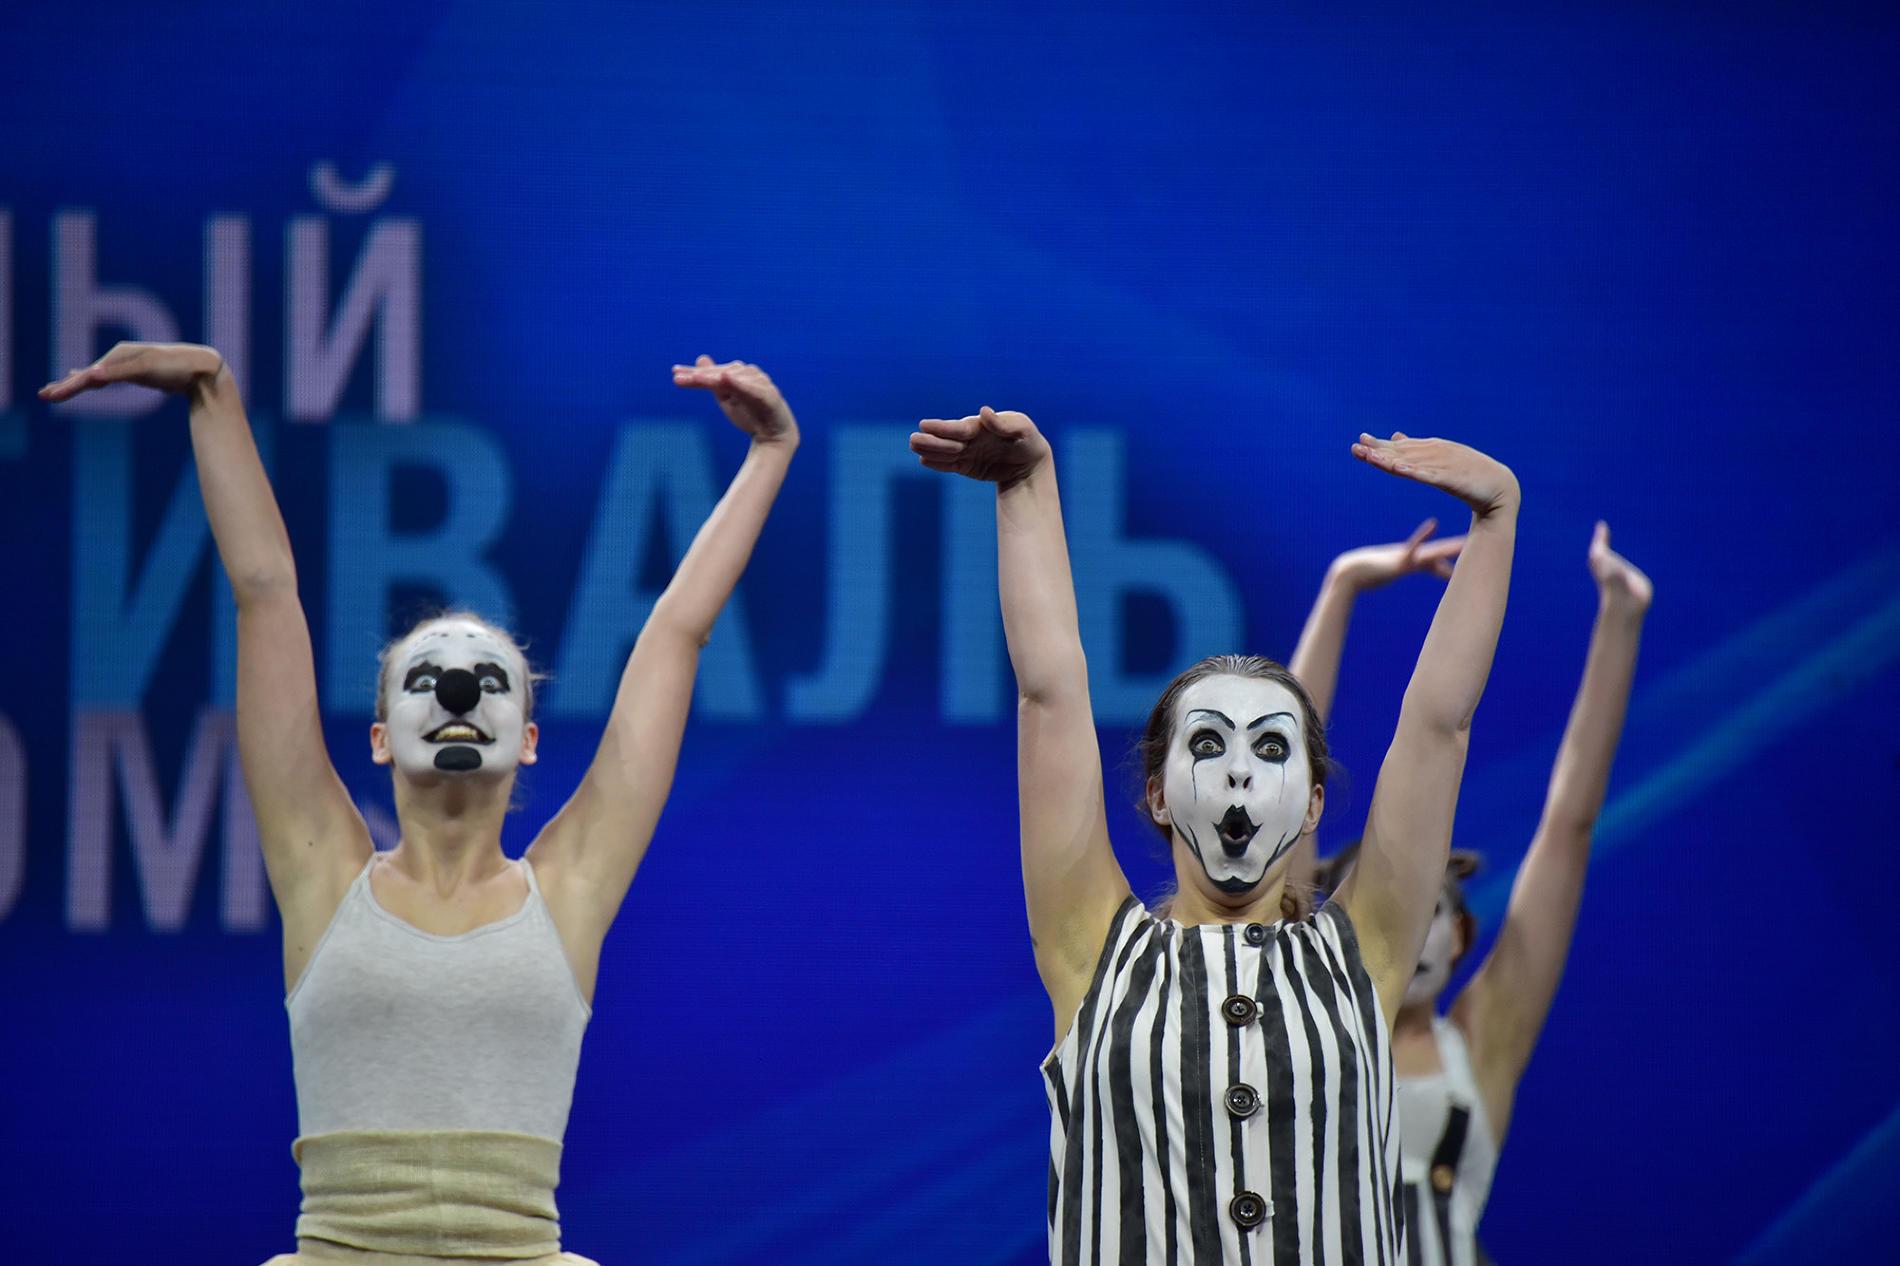 Третий конкурсный день фестиваля «Факел» ©Фото Антона Кардашова